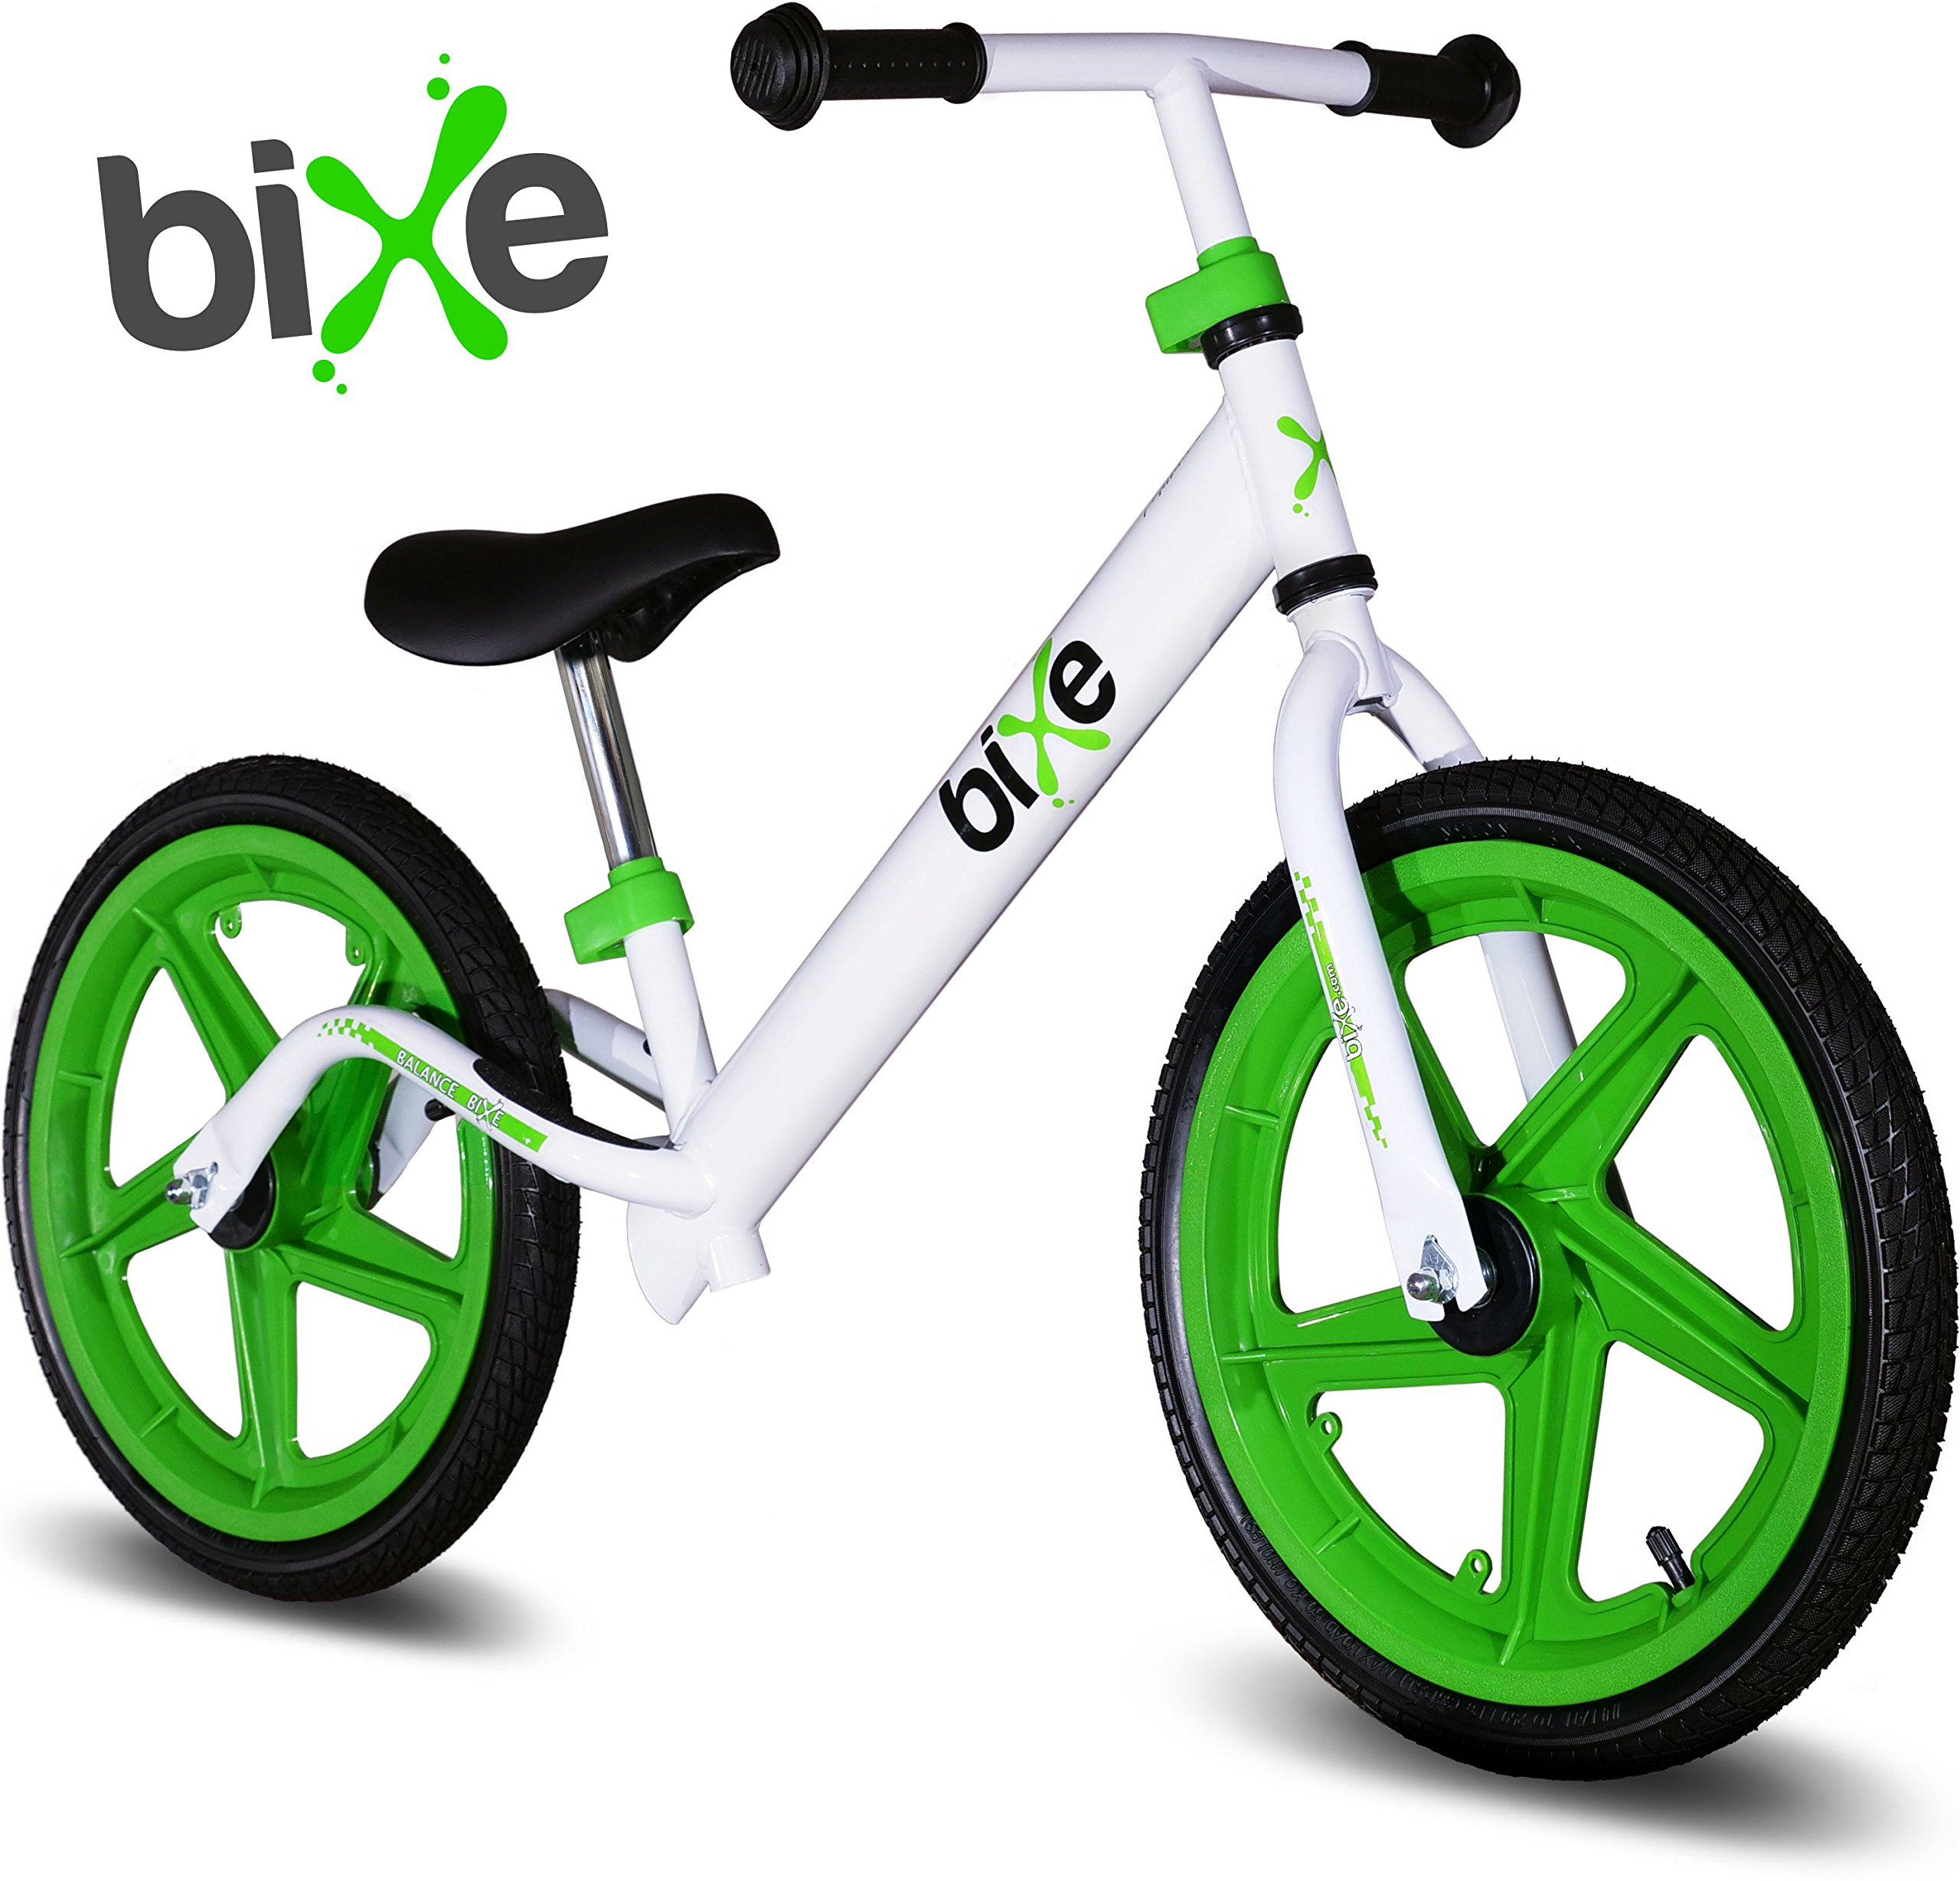 Balance Bike For Big Kids 5, 6, 7, 8 and 9 Years Old (Green) Bixe 16 in